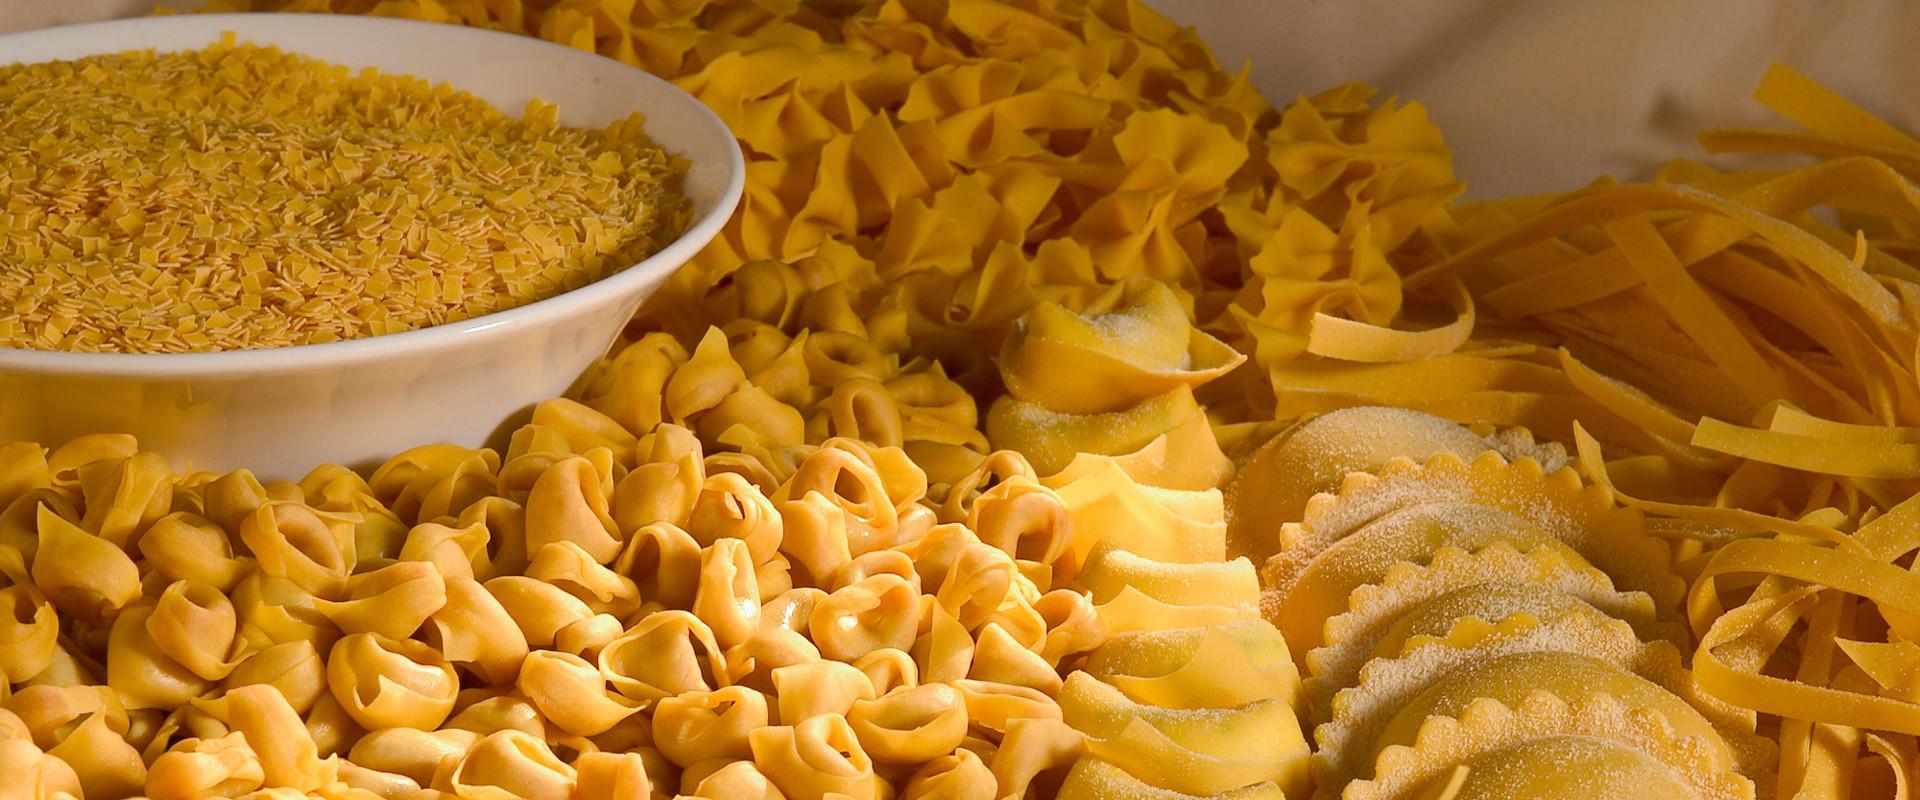 Foto: pasta fresca